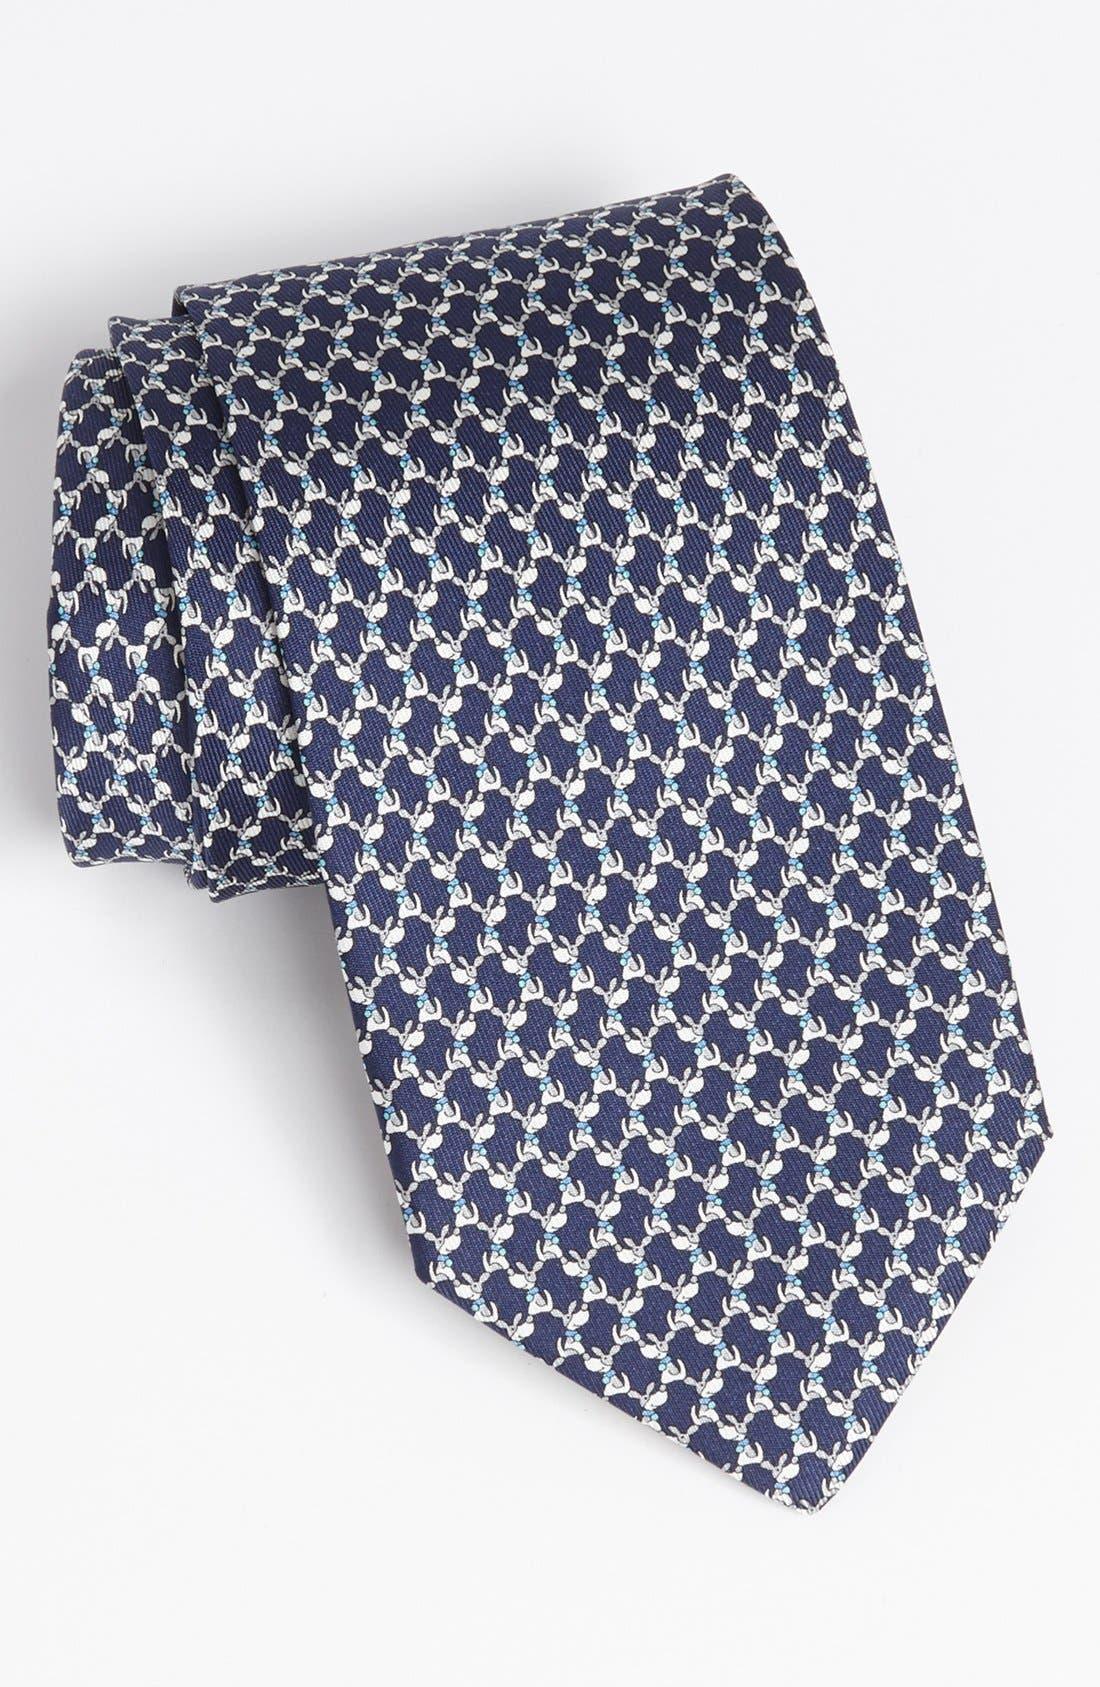 Alternate Image 1 Selected - Salvatore Ferragamo Kangaroo Print Silk Tie